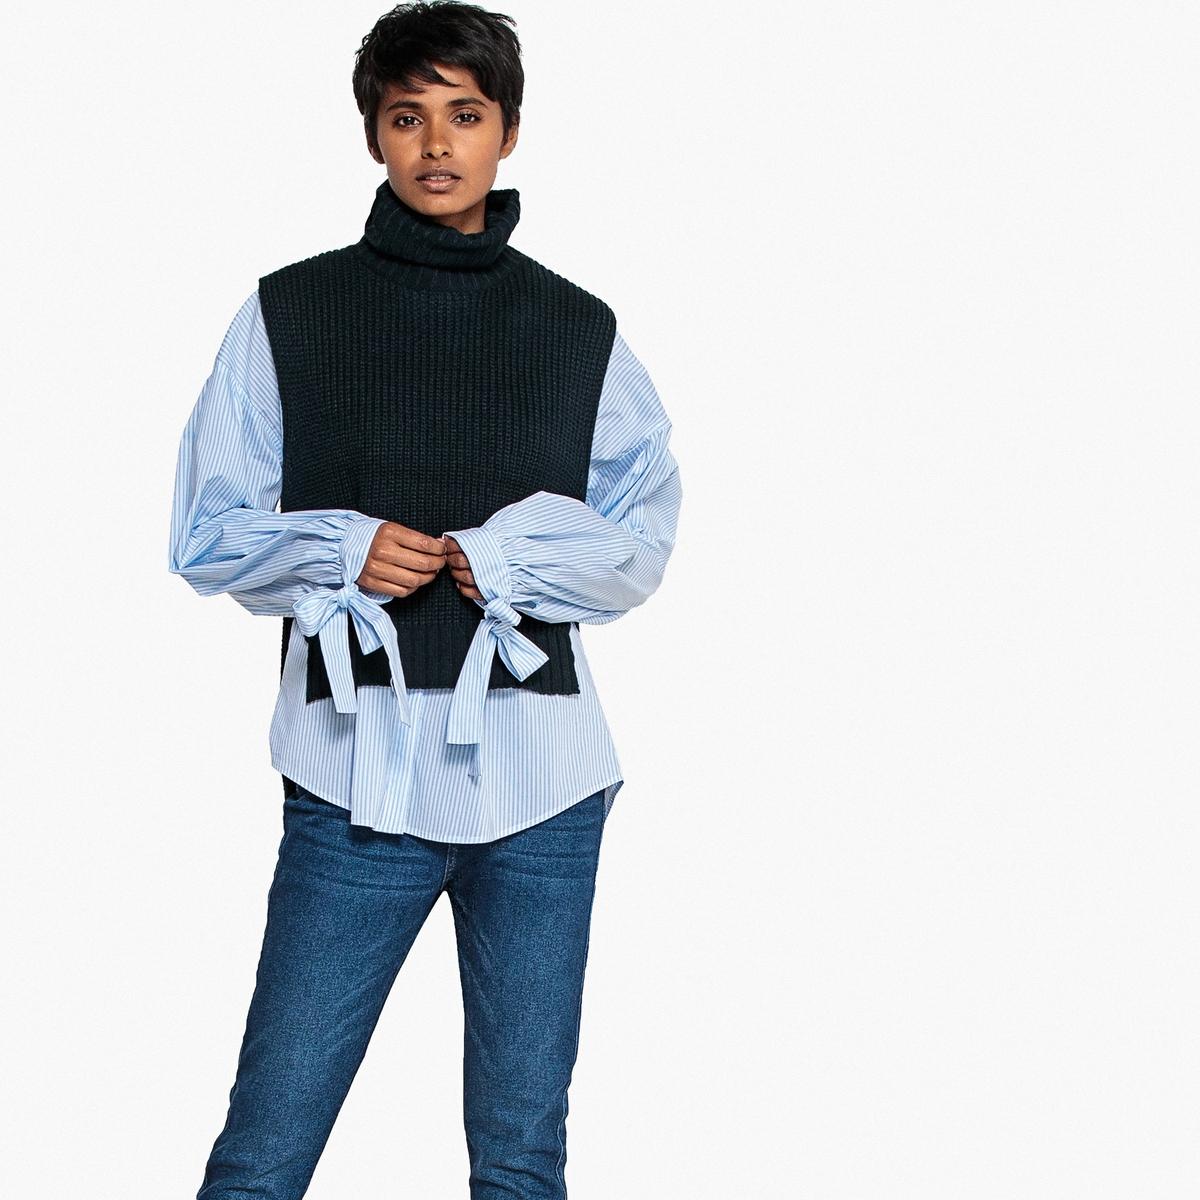 Пуловер La Redoute С воротником с отворотом без рукавов M синий комбинезон la redoute с вышивкой без рукавов m черный